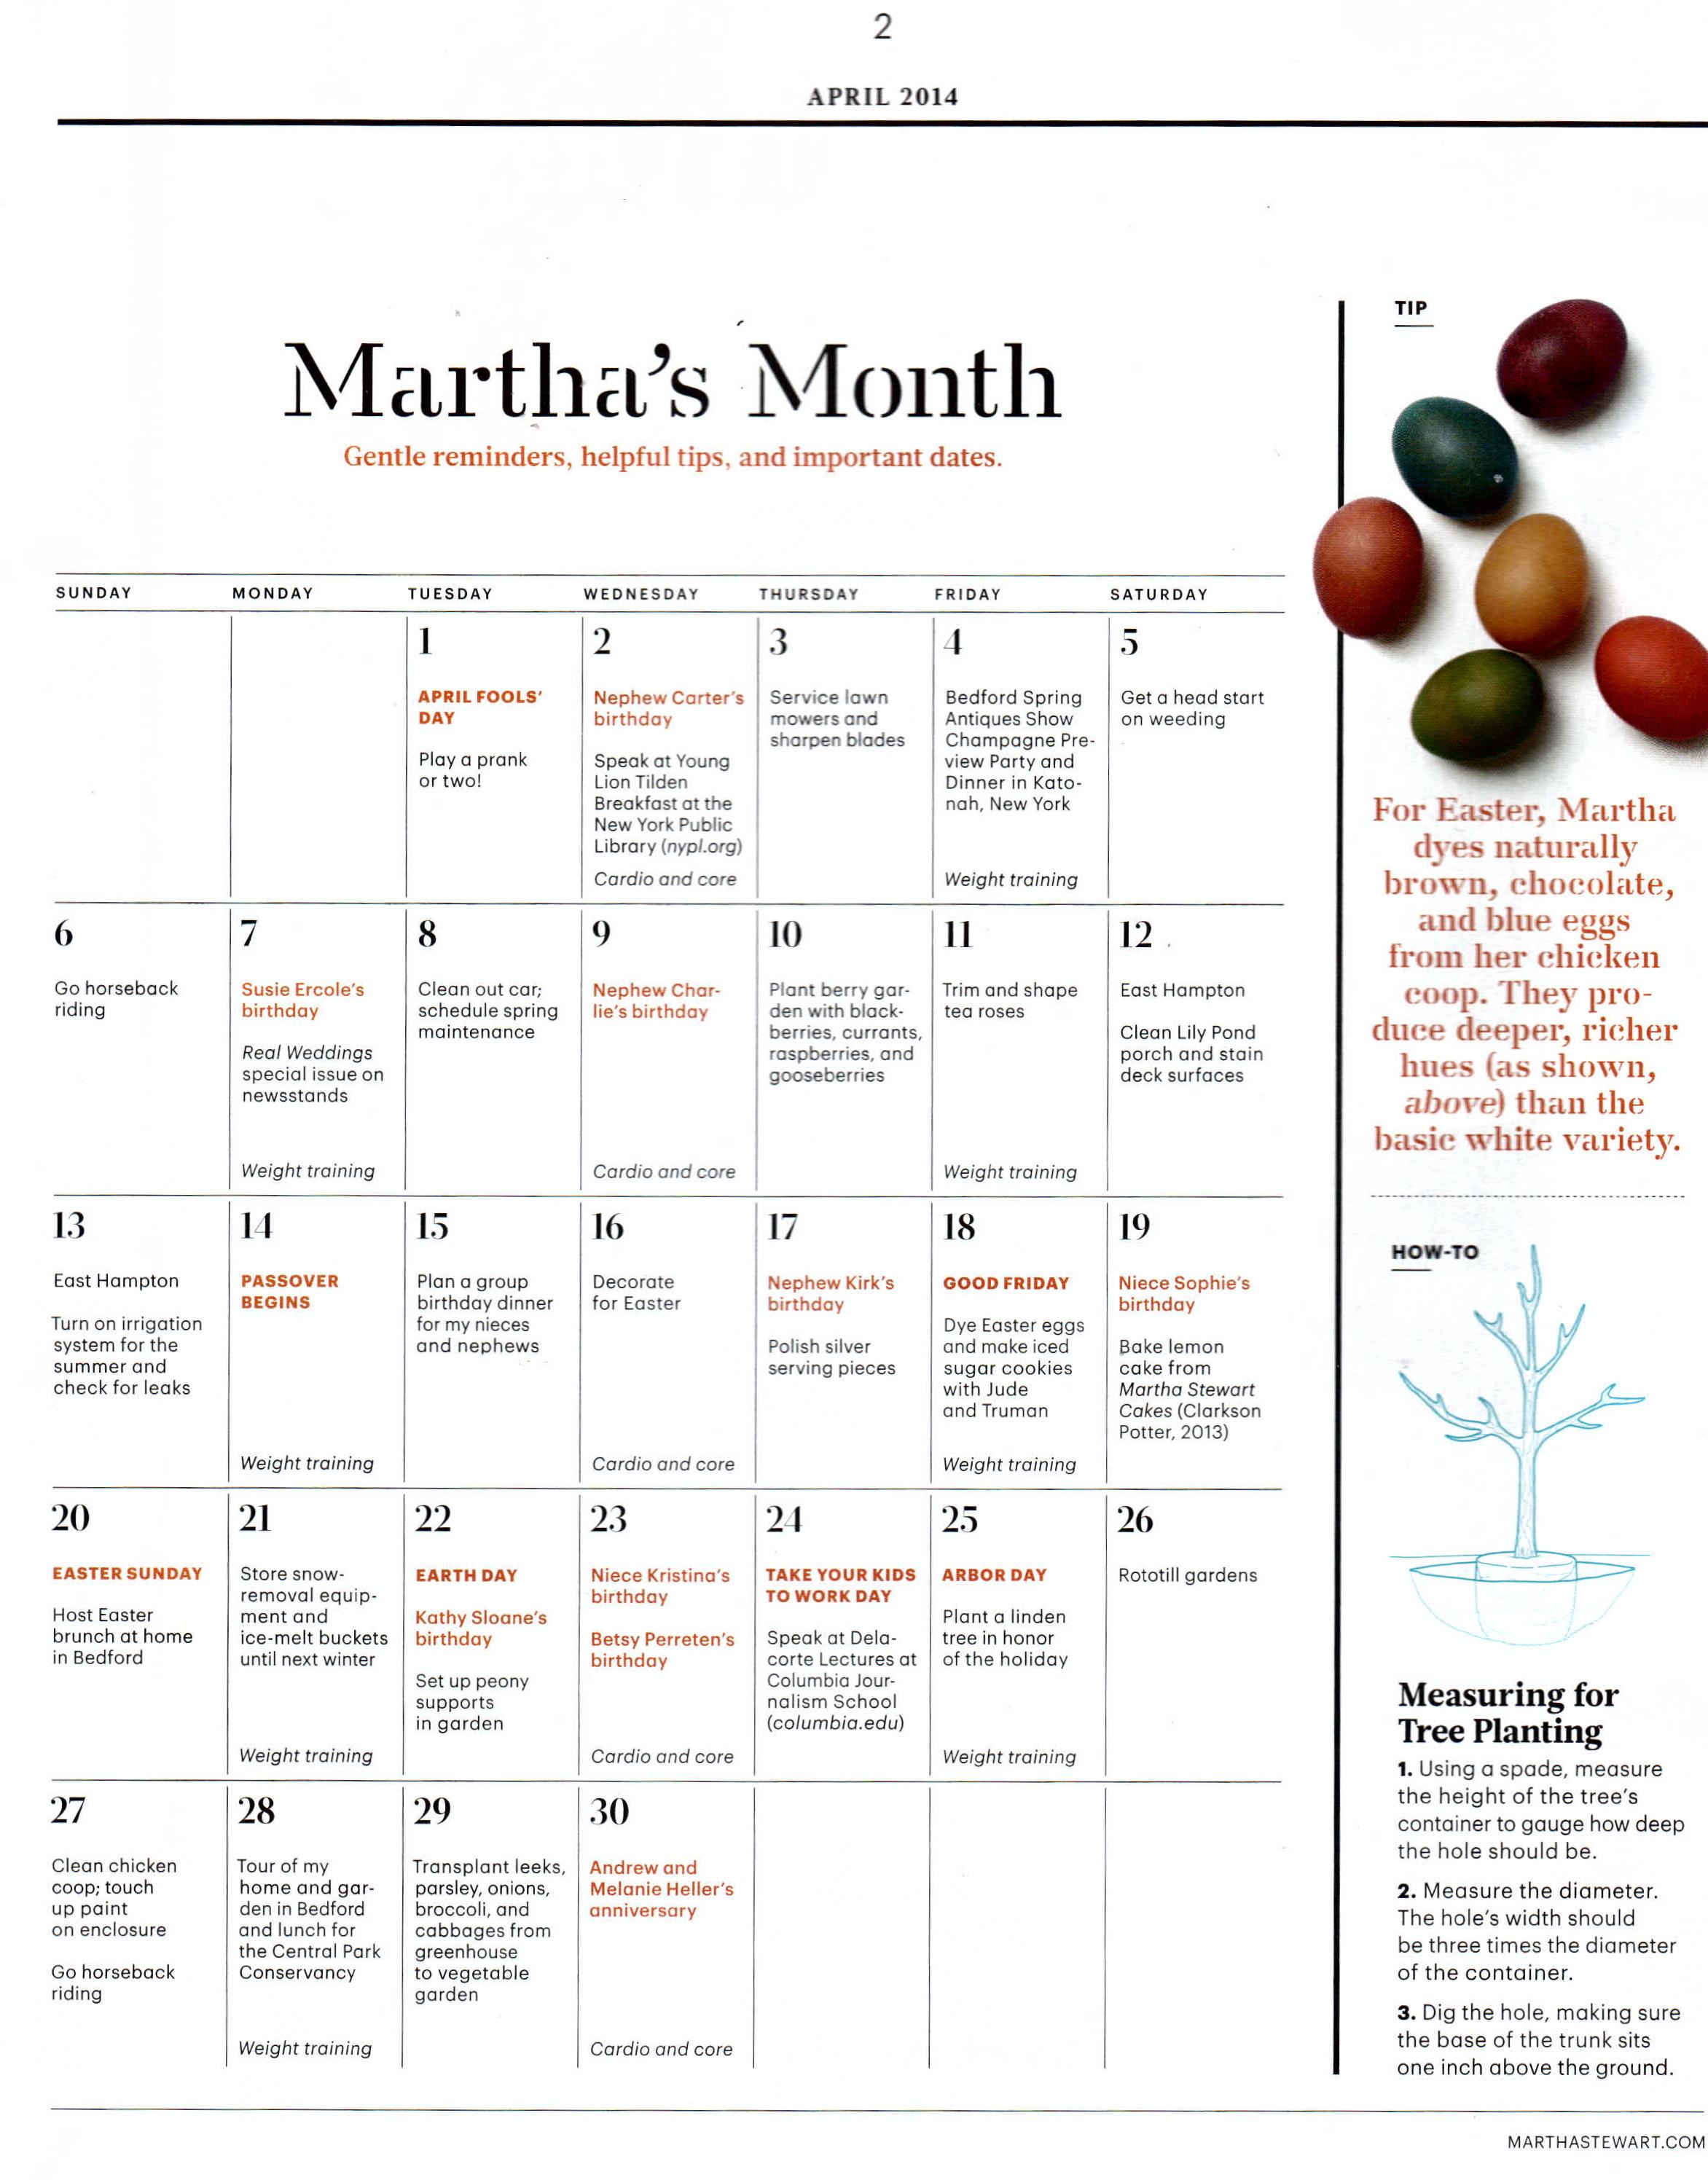 Martha Stewart Living, April 2014